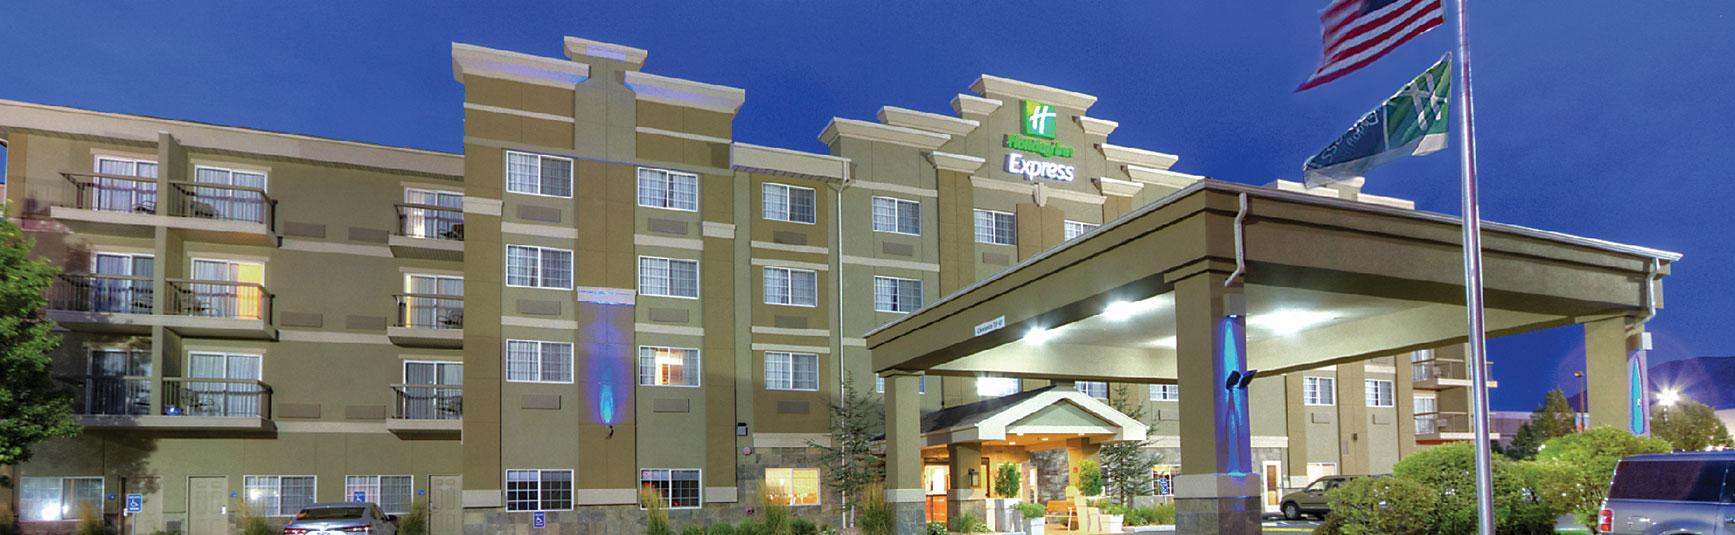 Holiday Inn Express – Salt Lake City/Layton